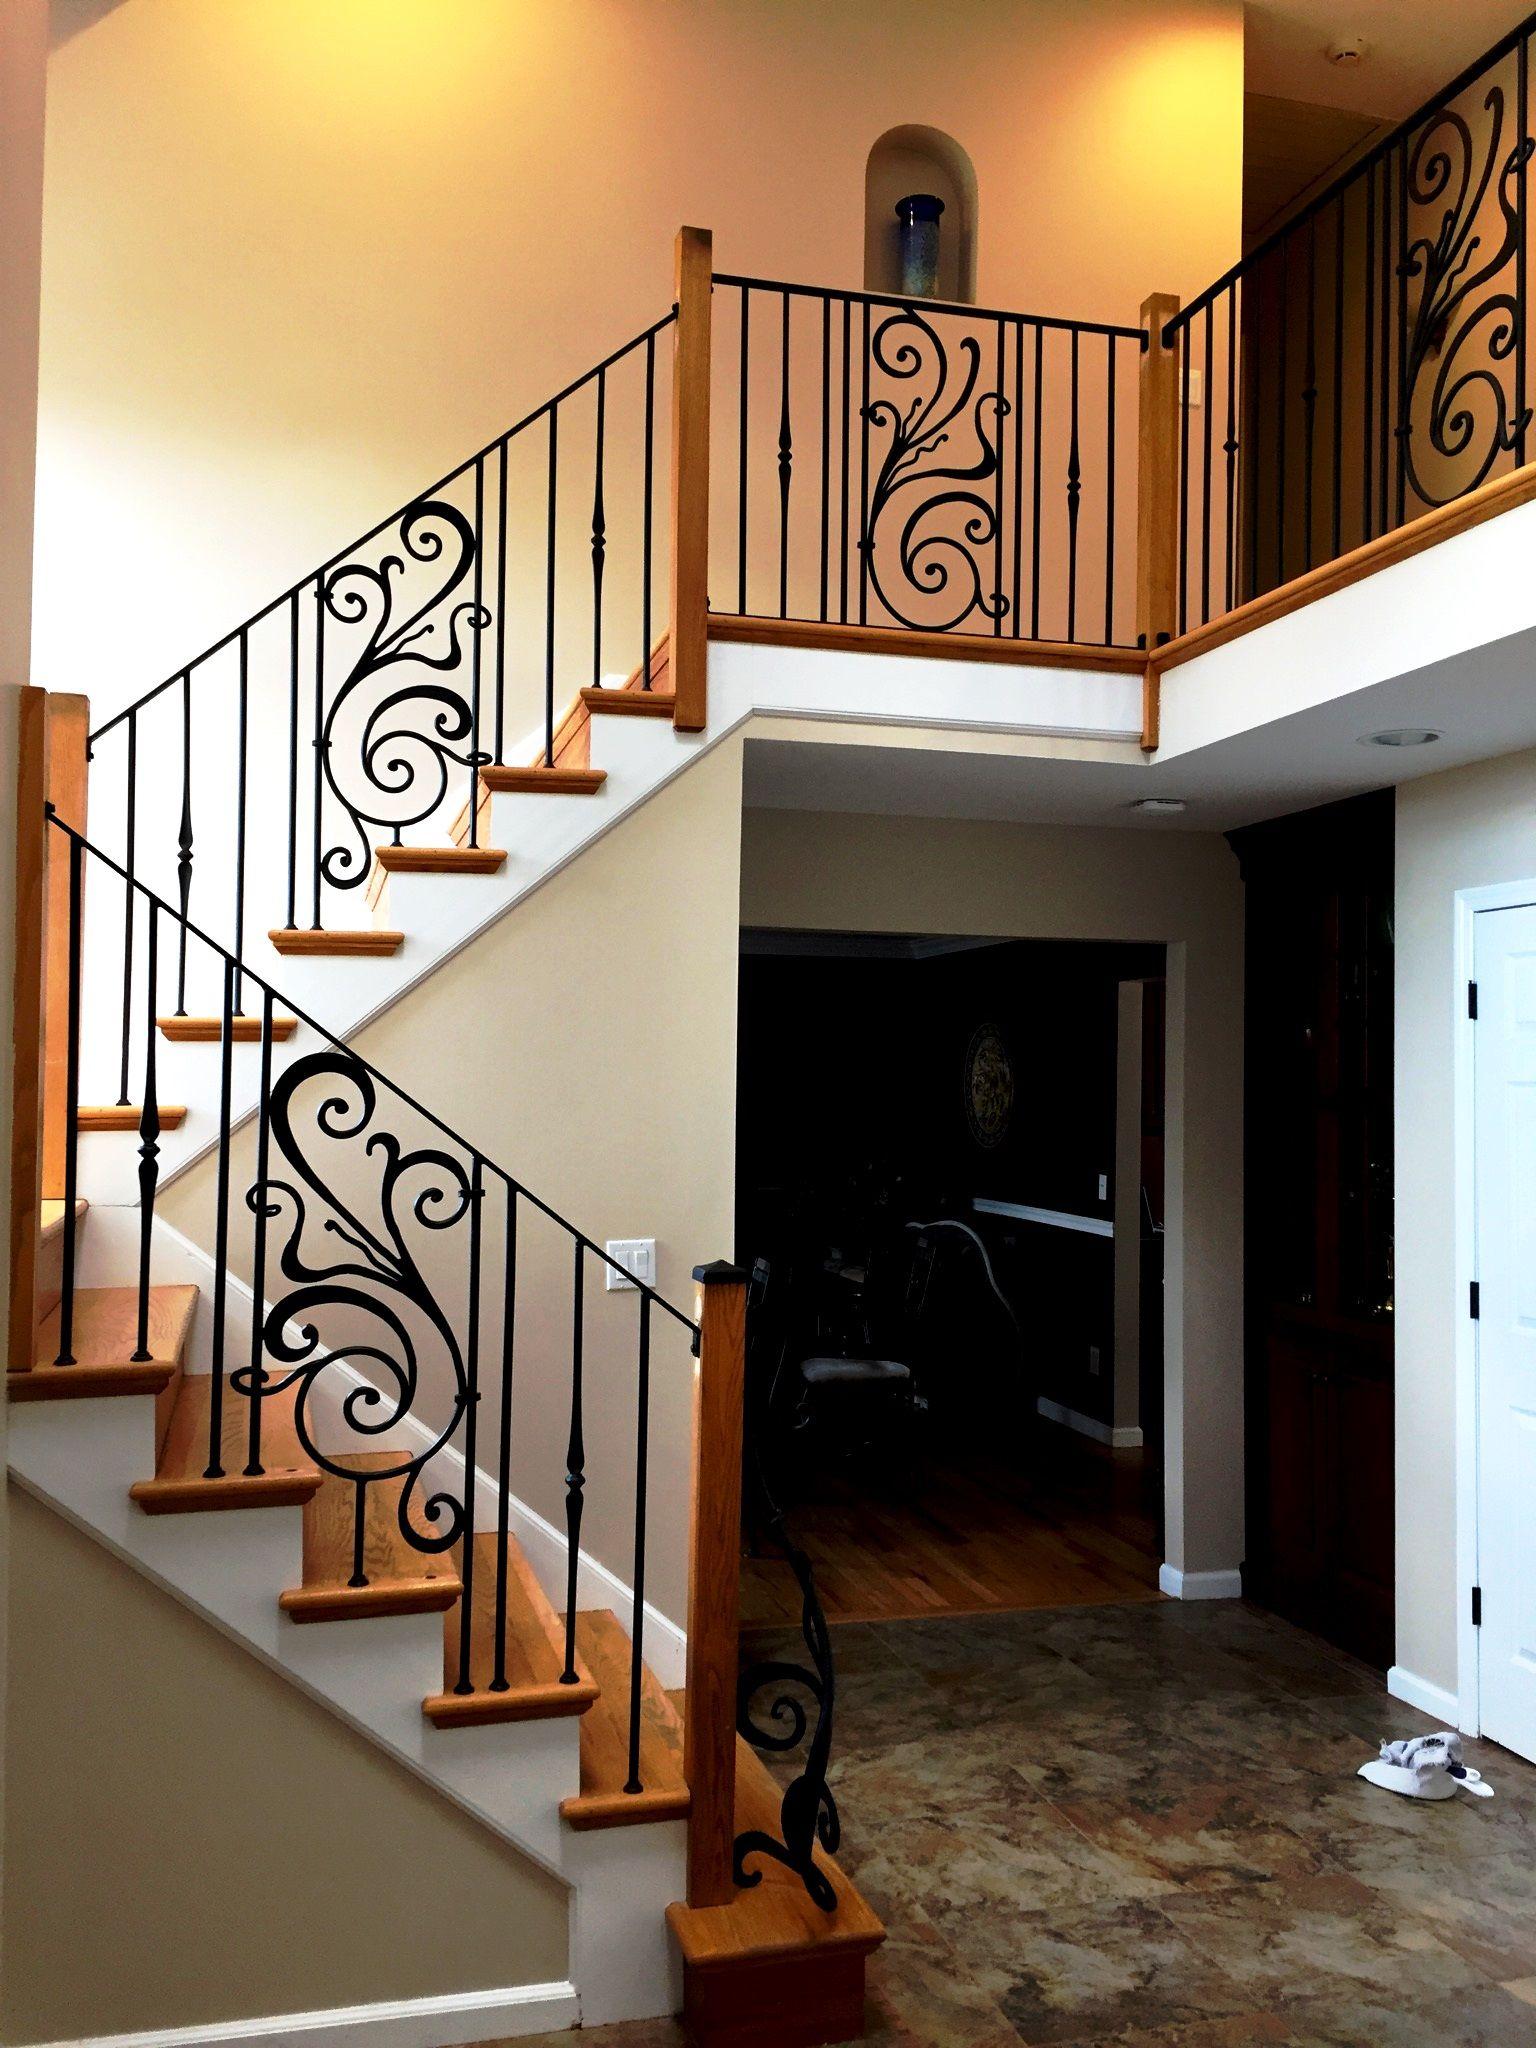 Interior Decorative Wrought Iron Railings